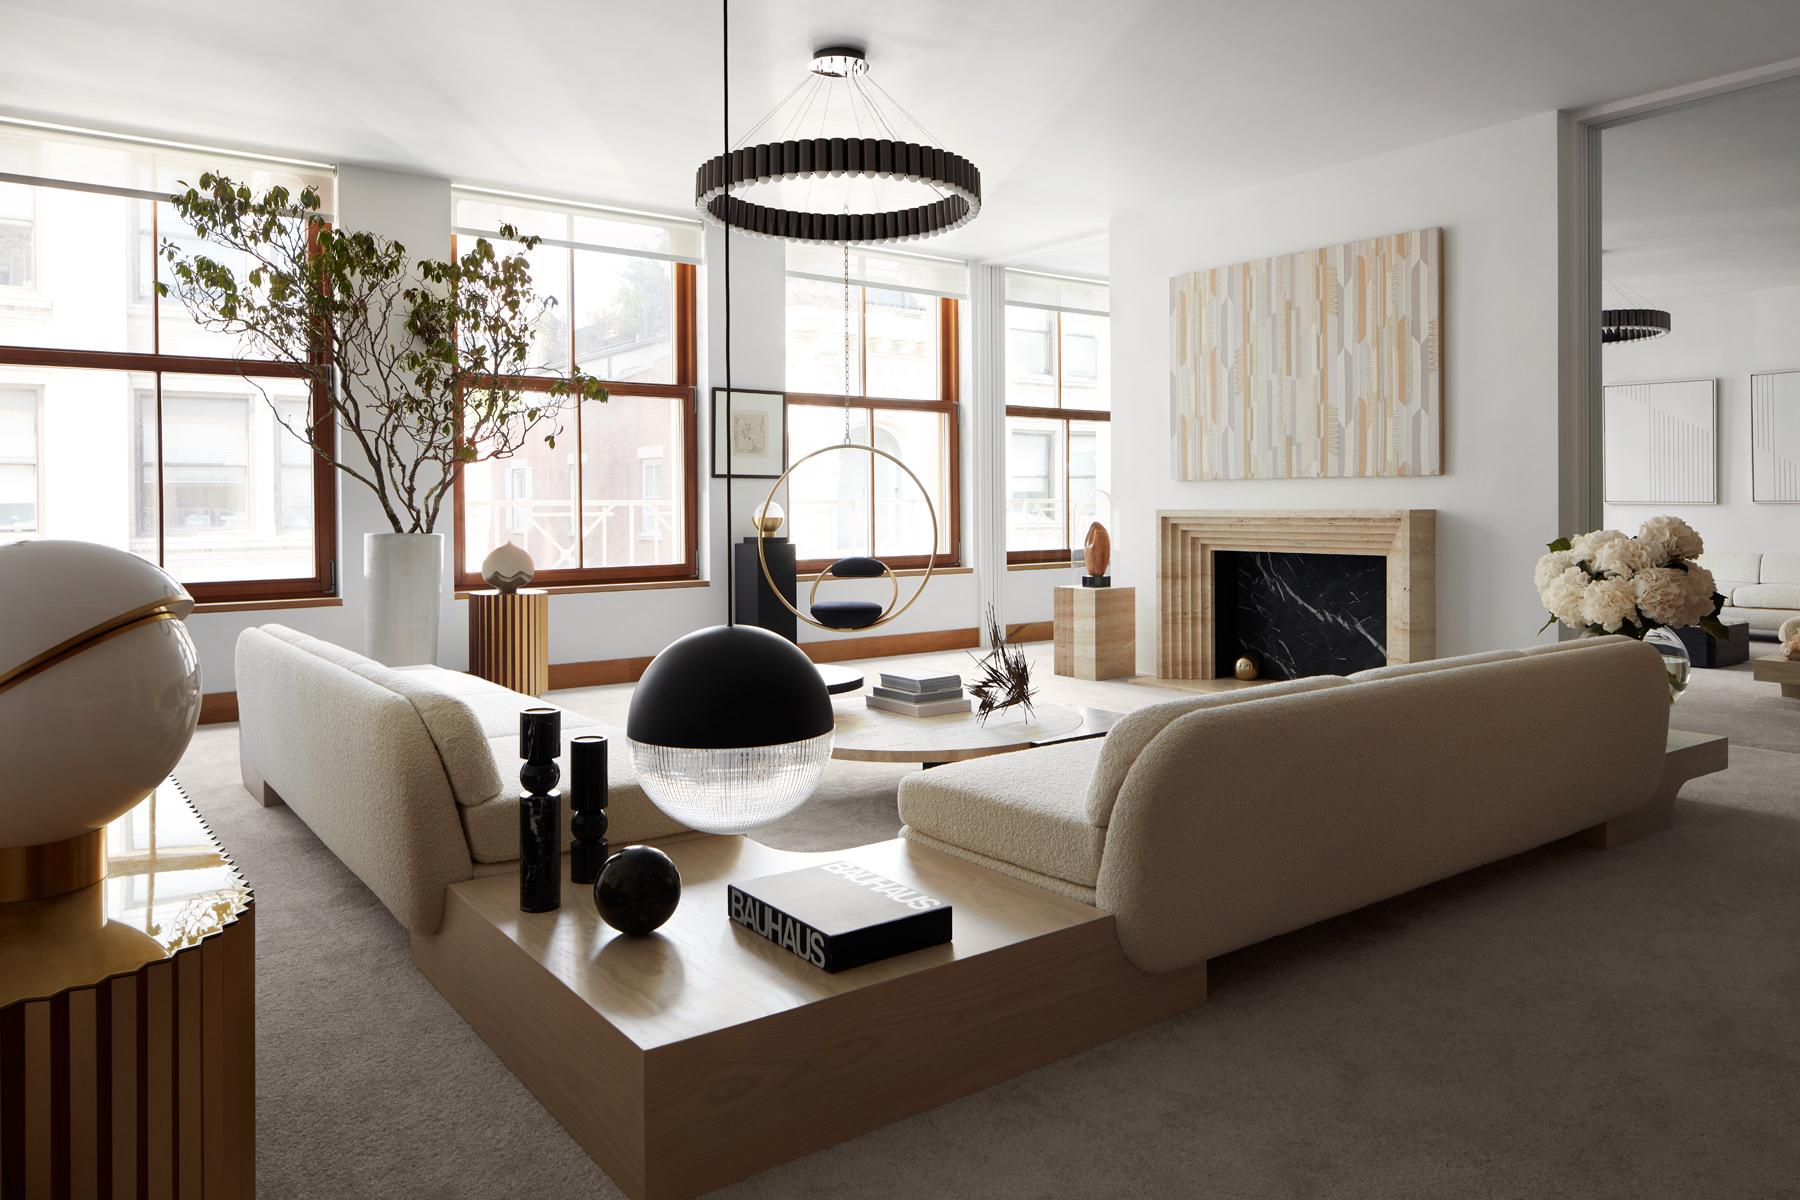 Lee Broom Penthouse New York Living Room Photo Stephen Kent Johnson Yellowtrace 05